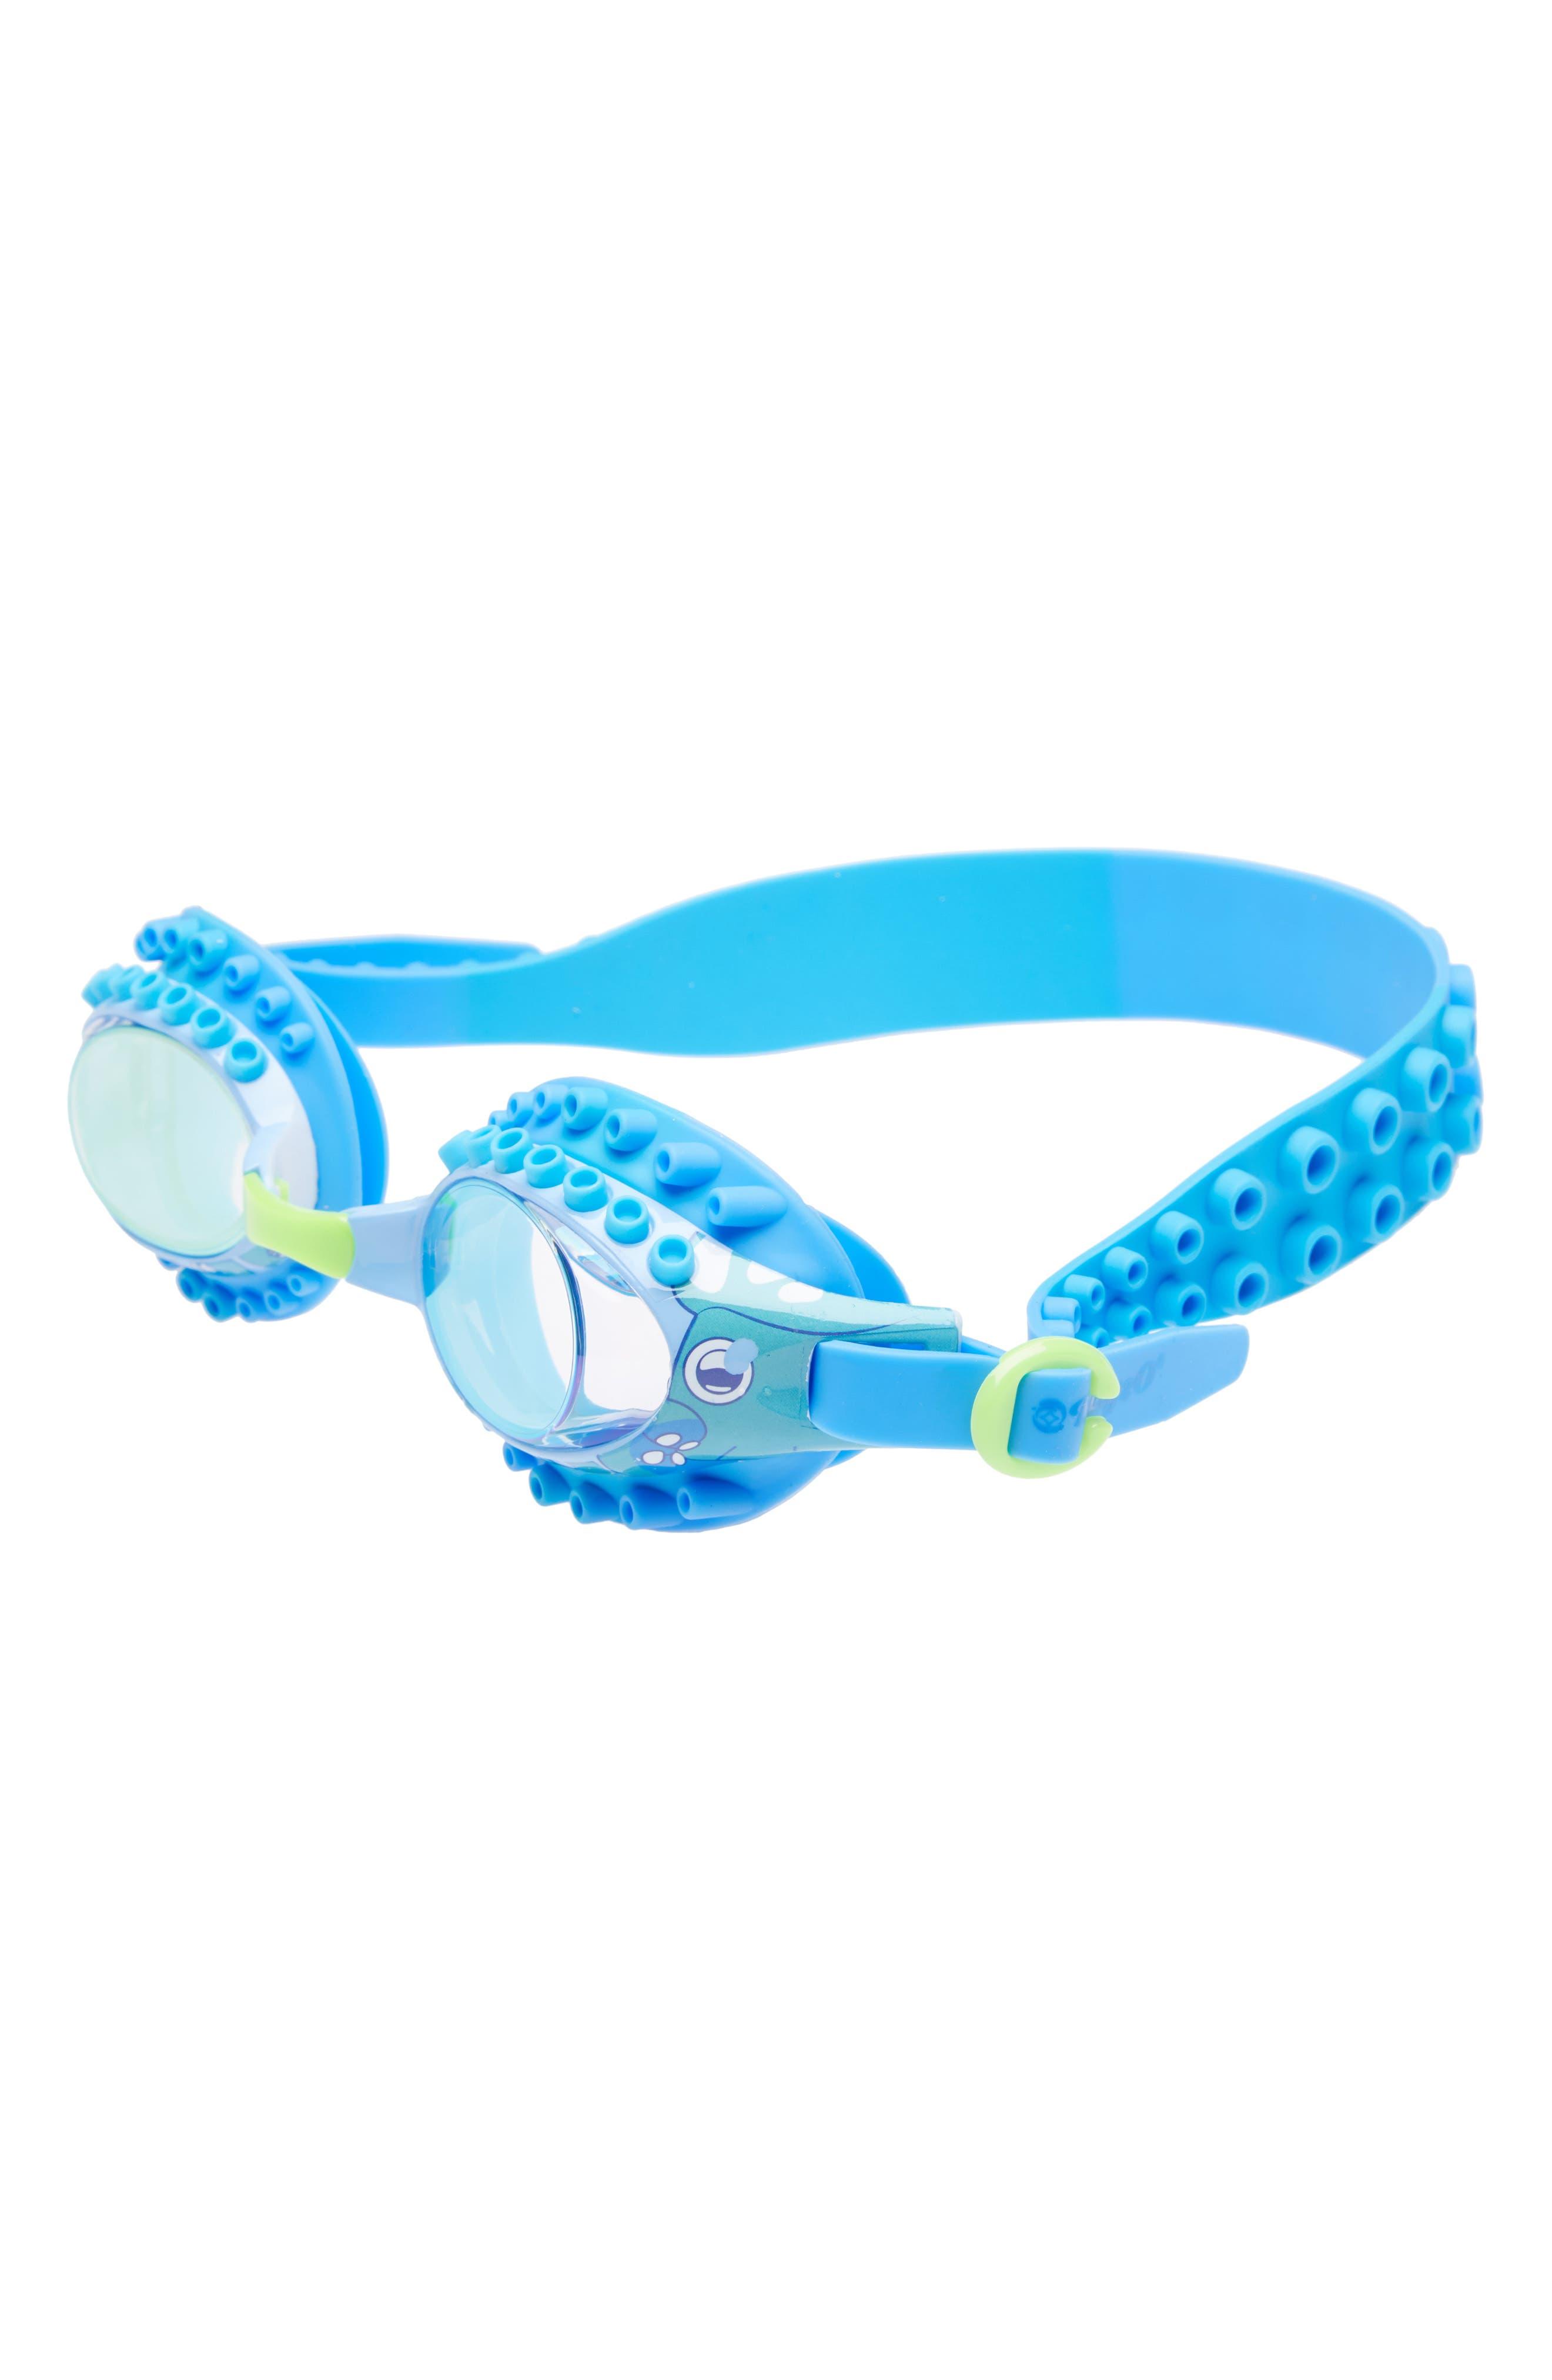 Octopus Swim Goggles,                         Main,                         color, 400